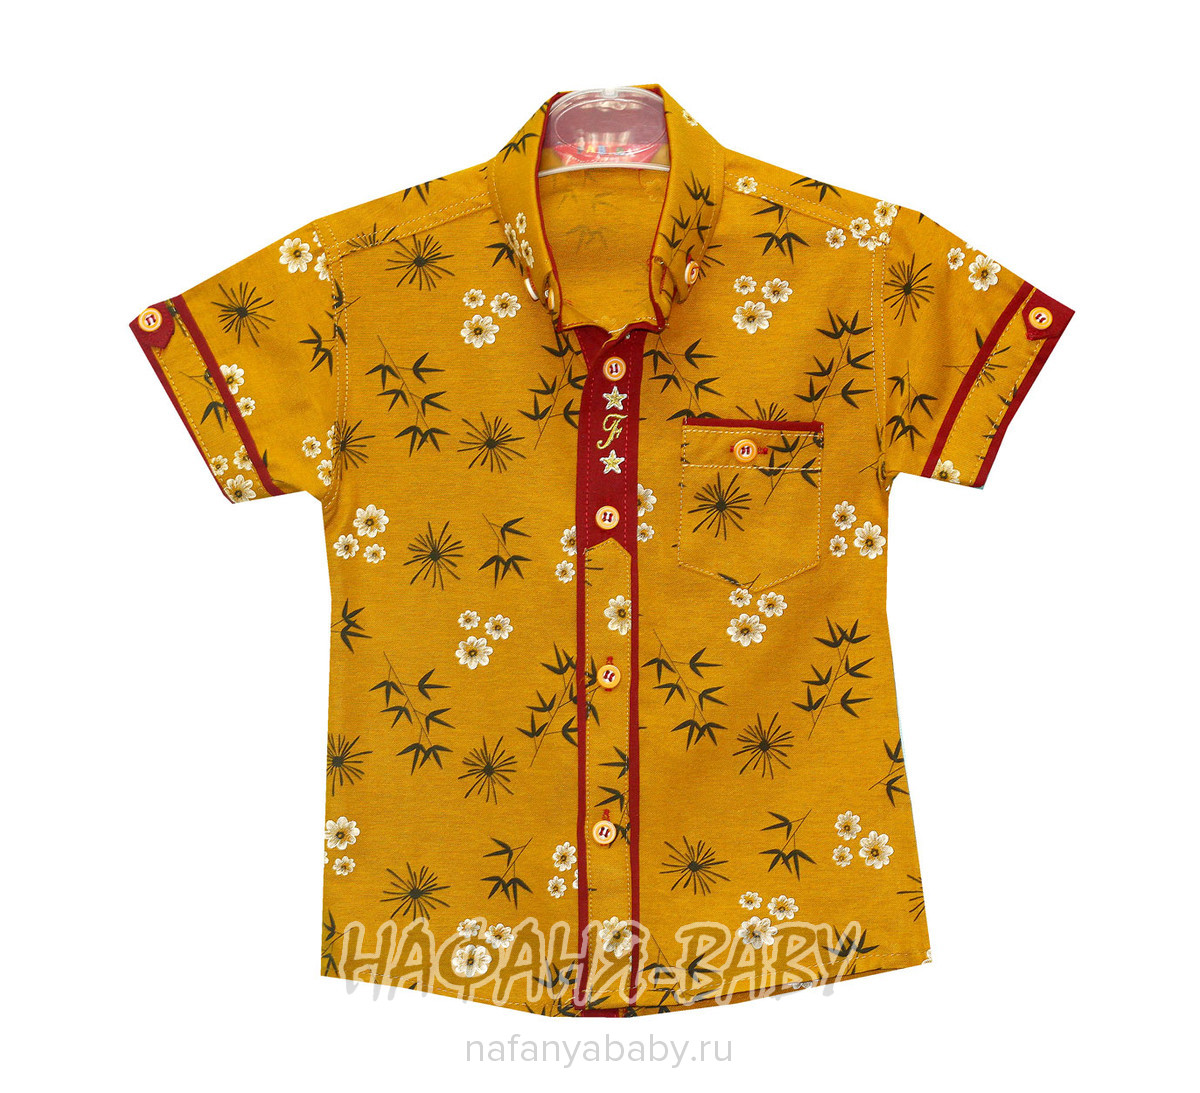 Детская рубашка FABISA арт: 116, 1-4 года, оптом Турция